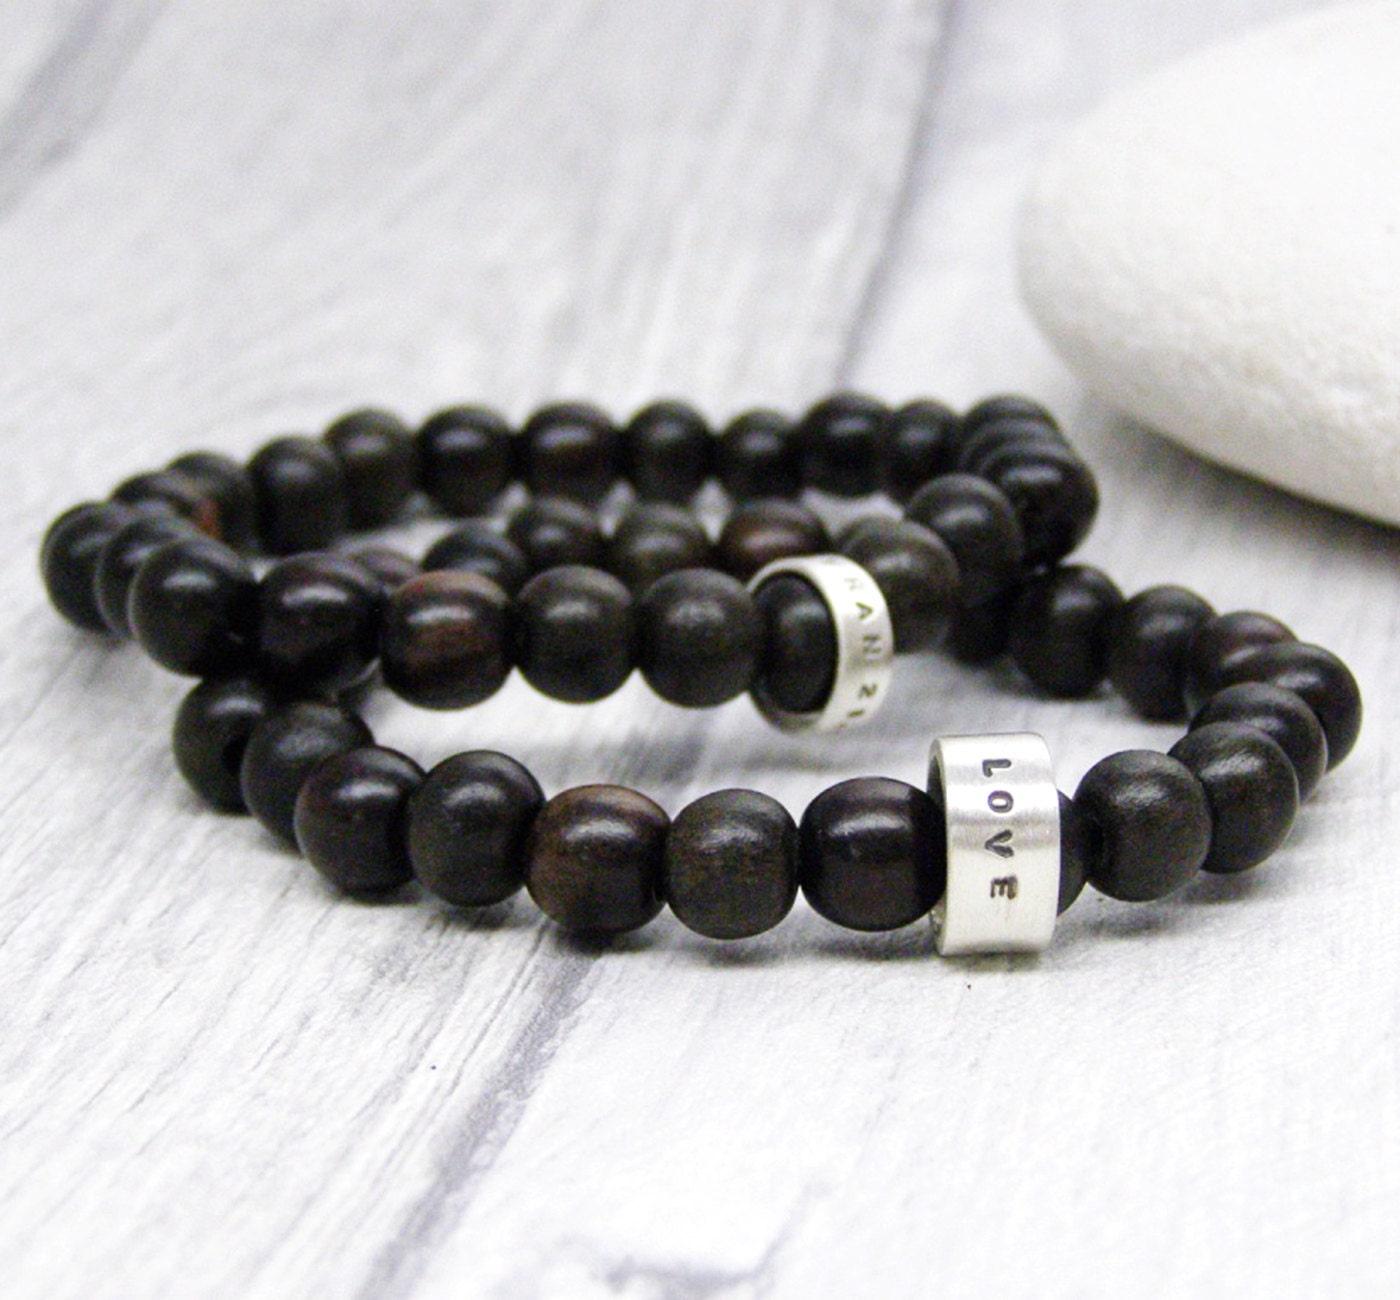 personalised wood bead mens bracelet id beaded bracelet. Black Bedroom Furniture Sets. Home Design Ideas